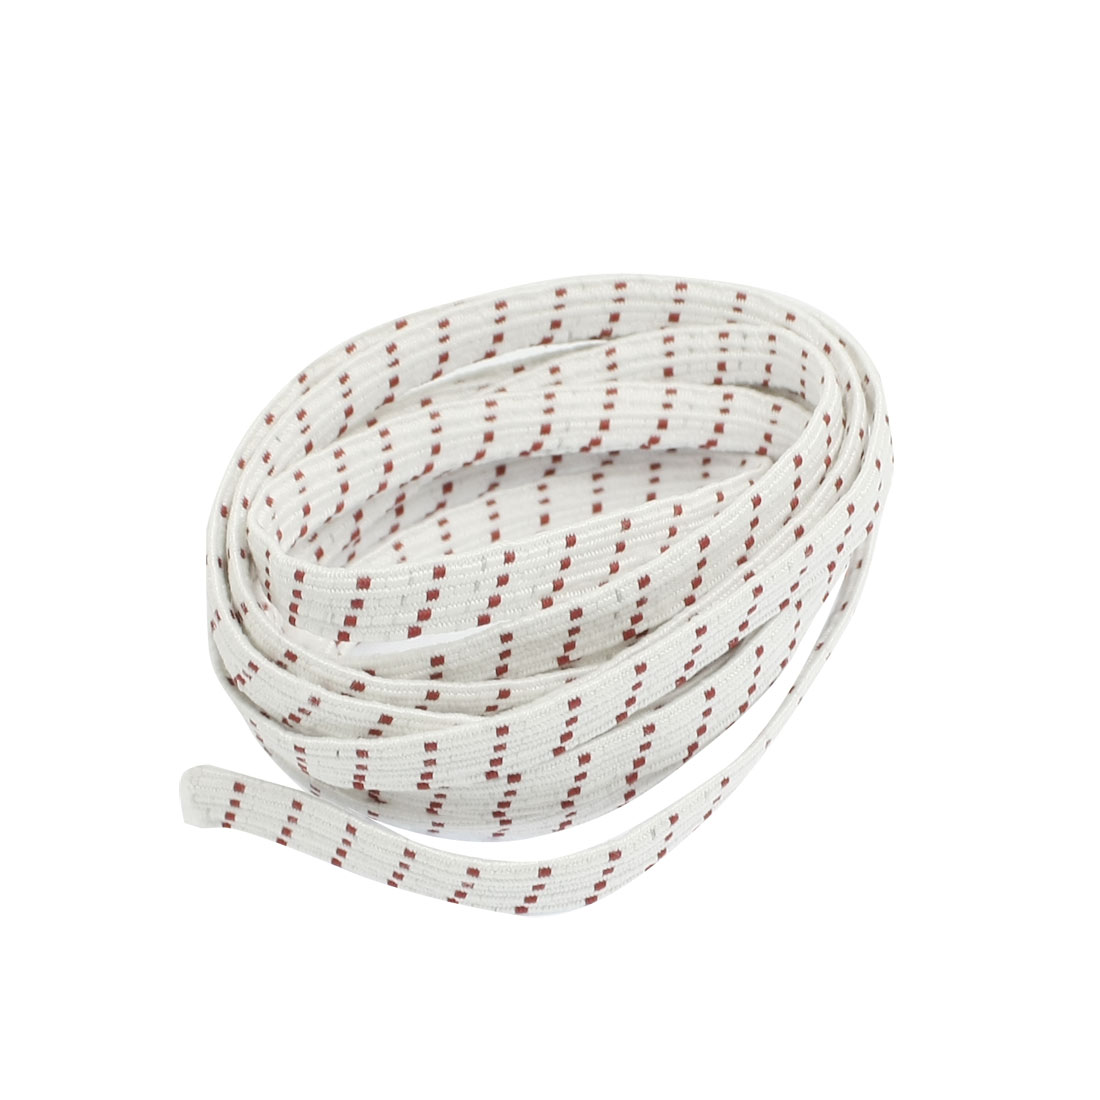 Ladies Textured Elastic Waist Belt Corset Band White Red